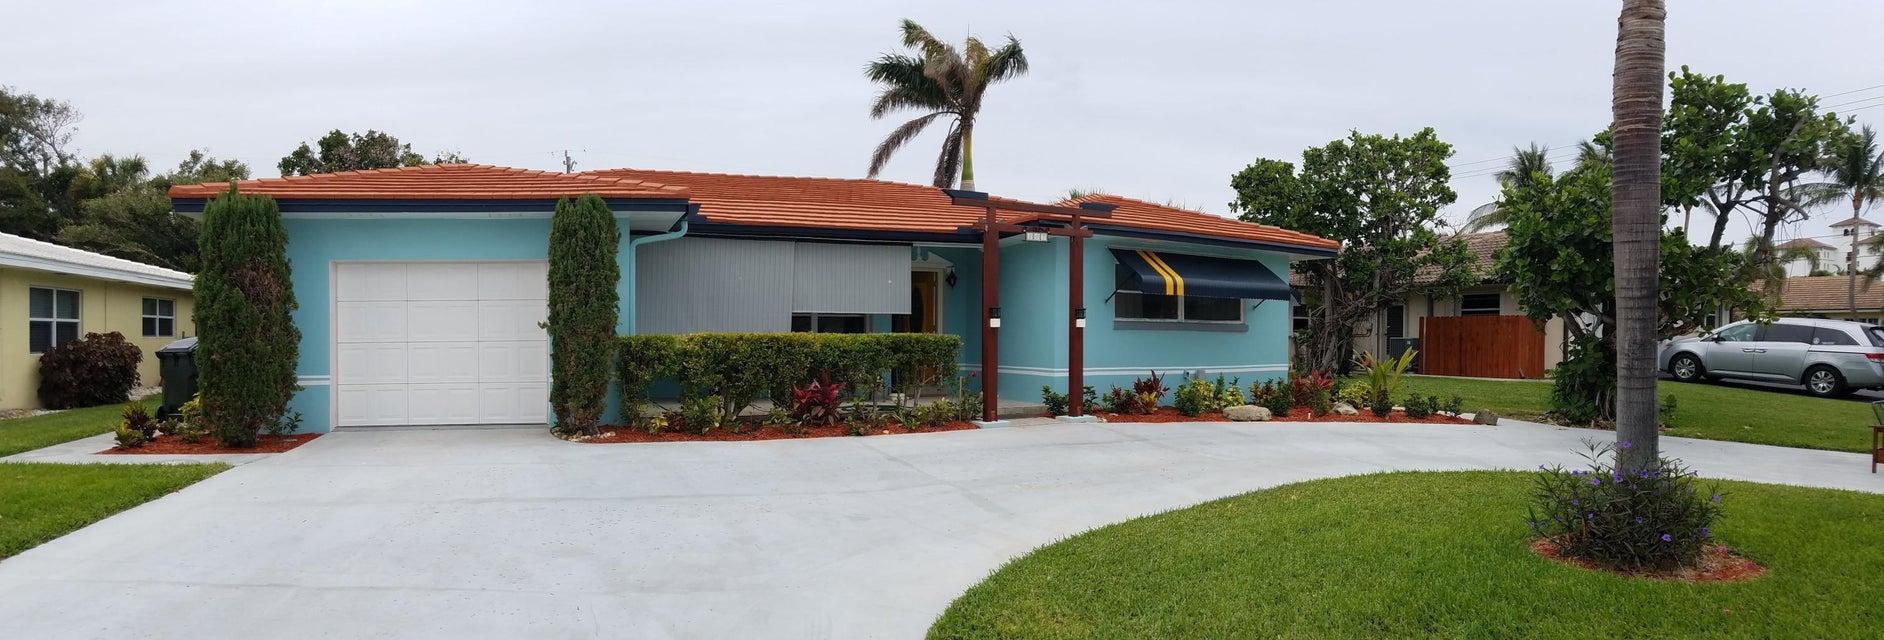 207 Bravado Lane  Palm Beach Shores FL 33404